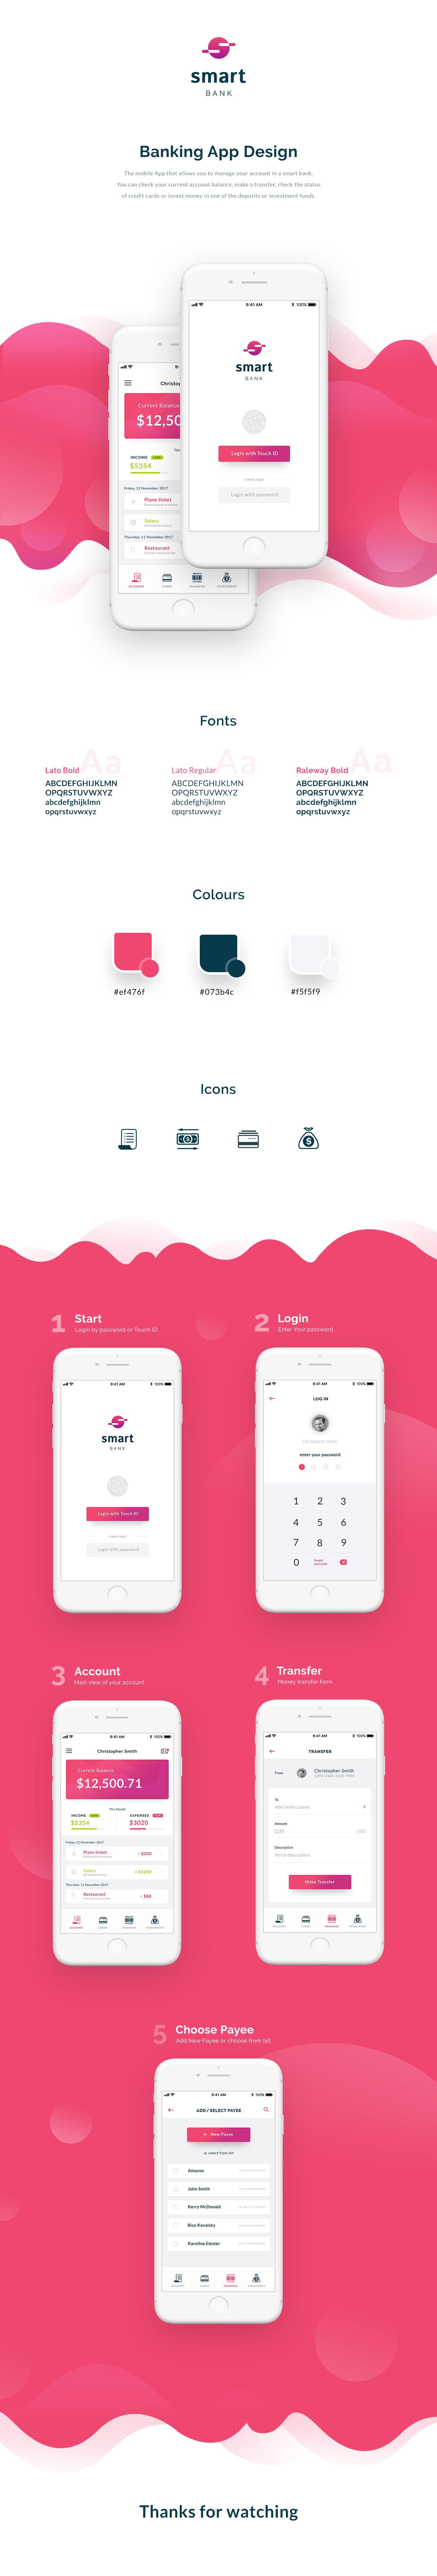 UI Webdesign app mobile ux photoshop Illustrator uidesign MOBILE BANK